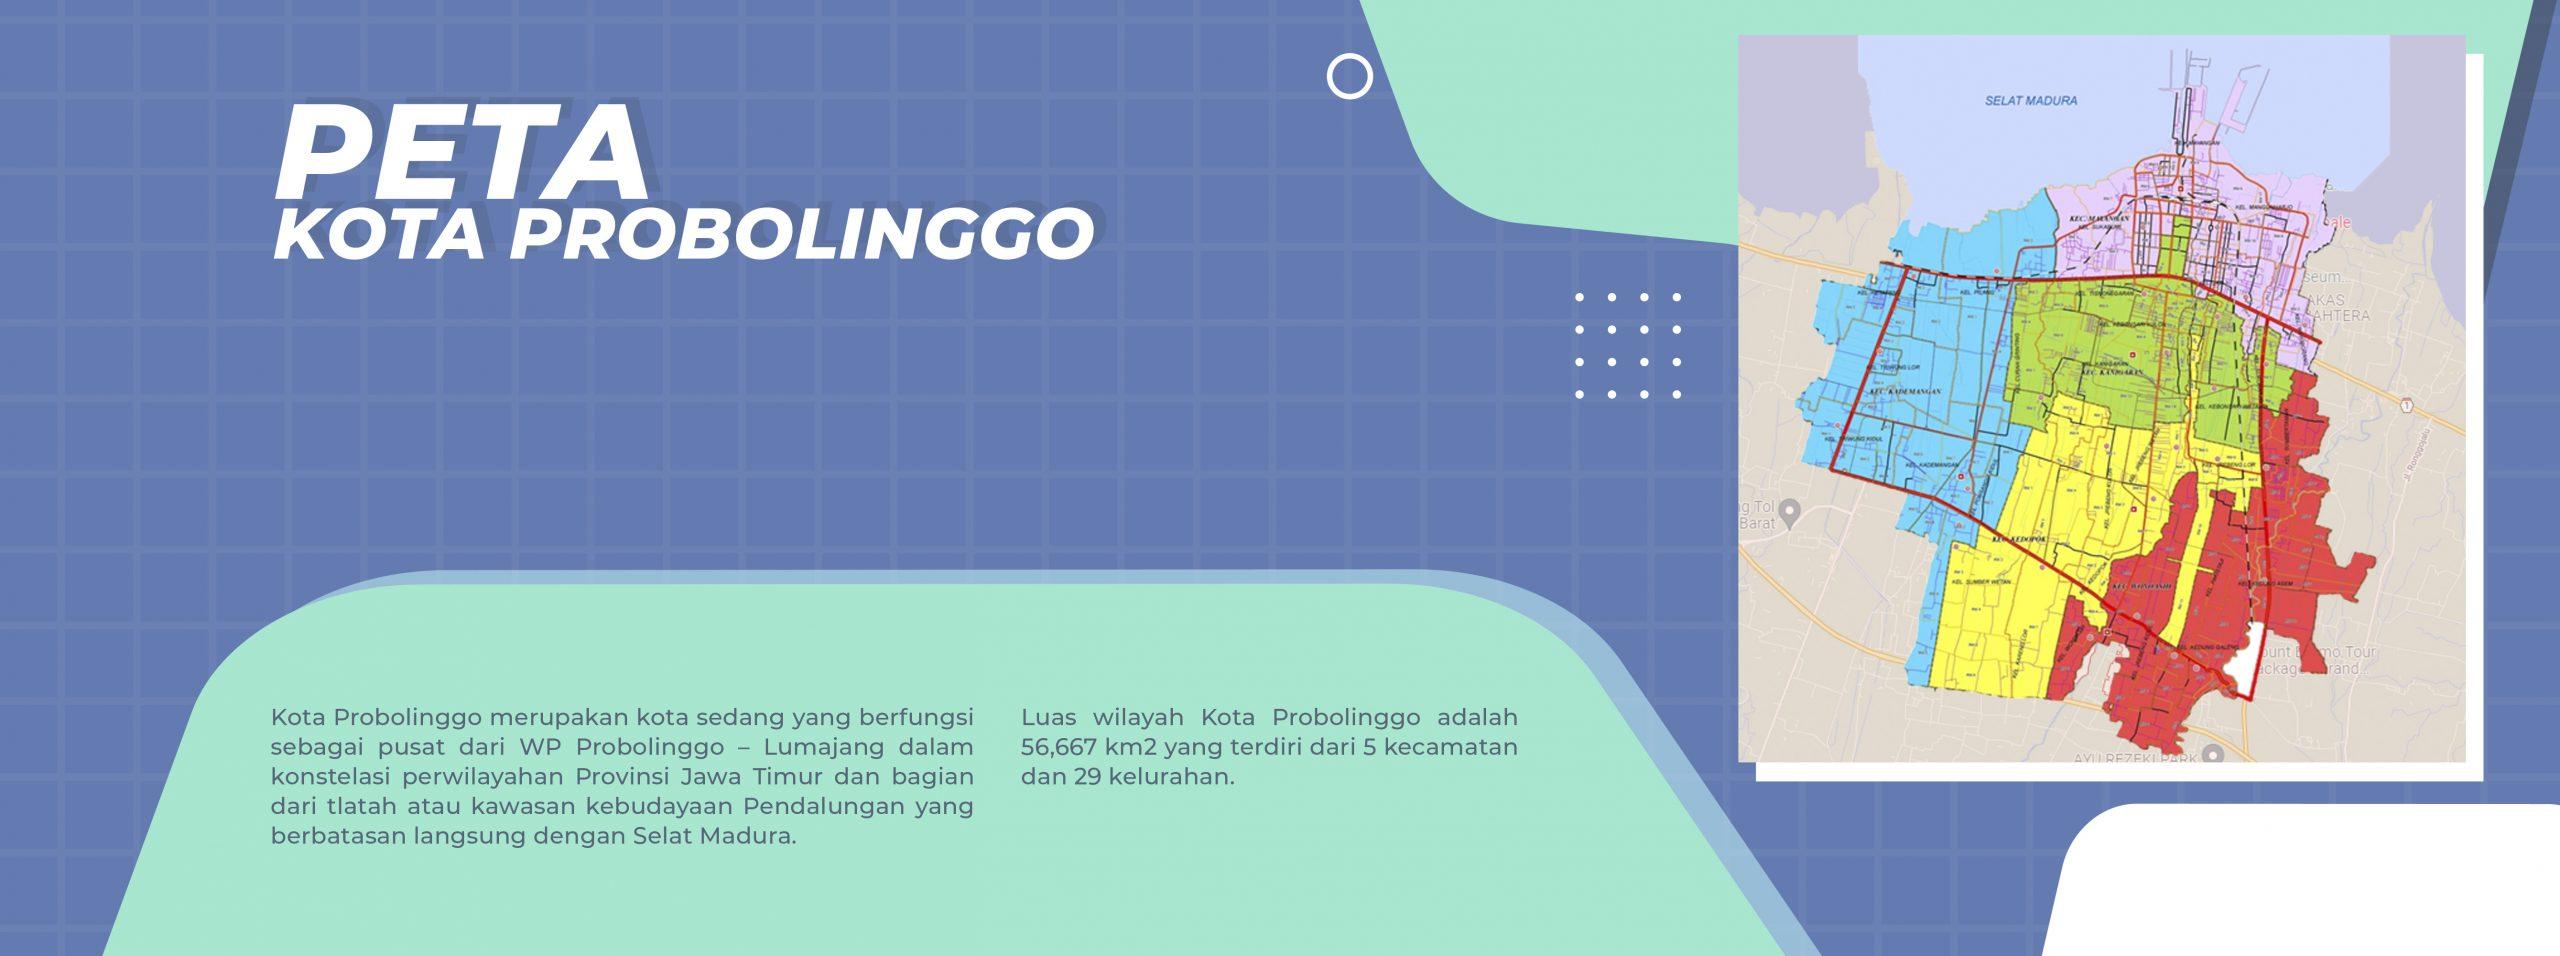 Selamat Datang Di Website Resmi Bappedalitbang Kota Probolinggo